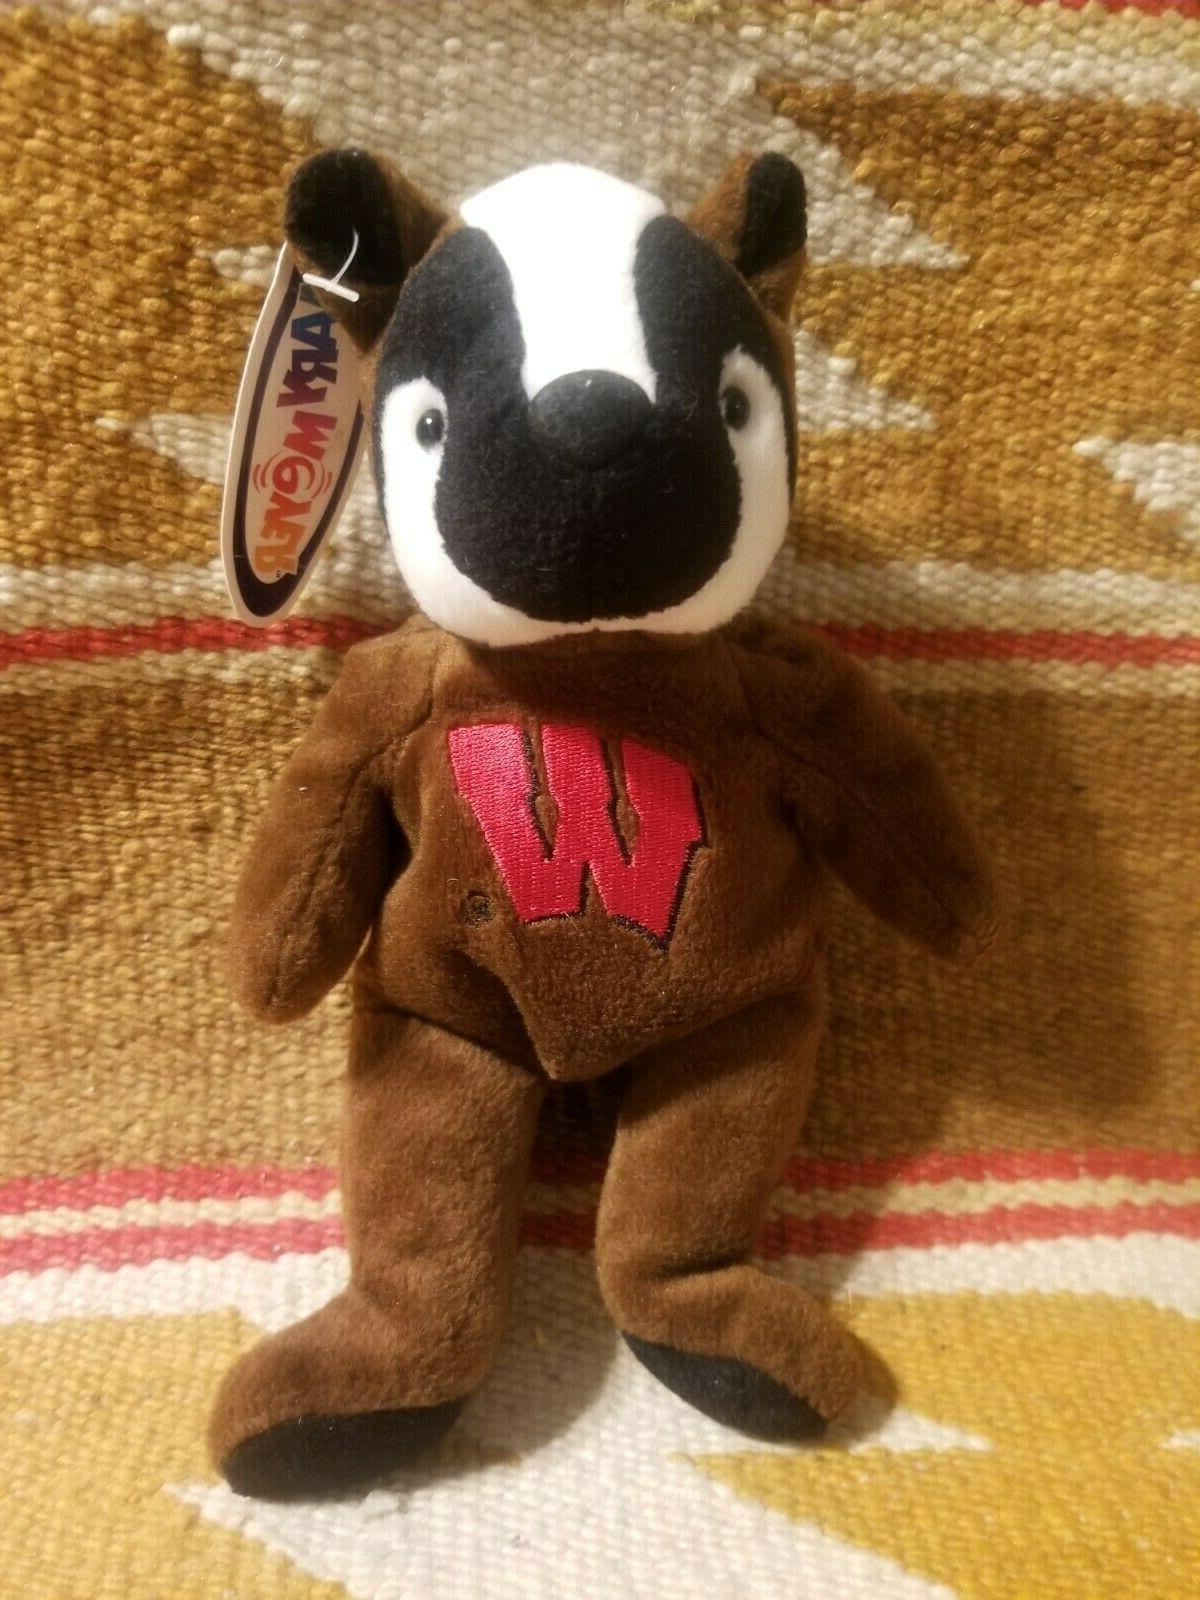 wisconsin bucky badger plush uw madison stuffed